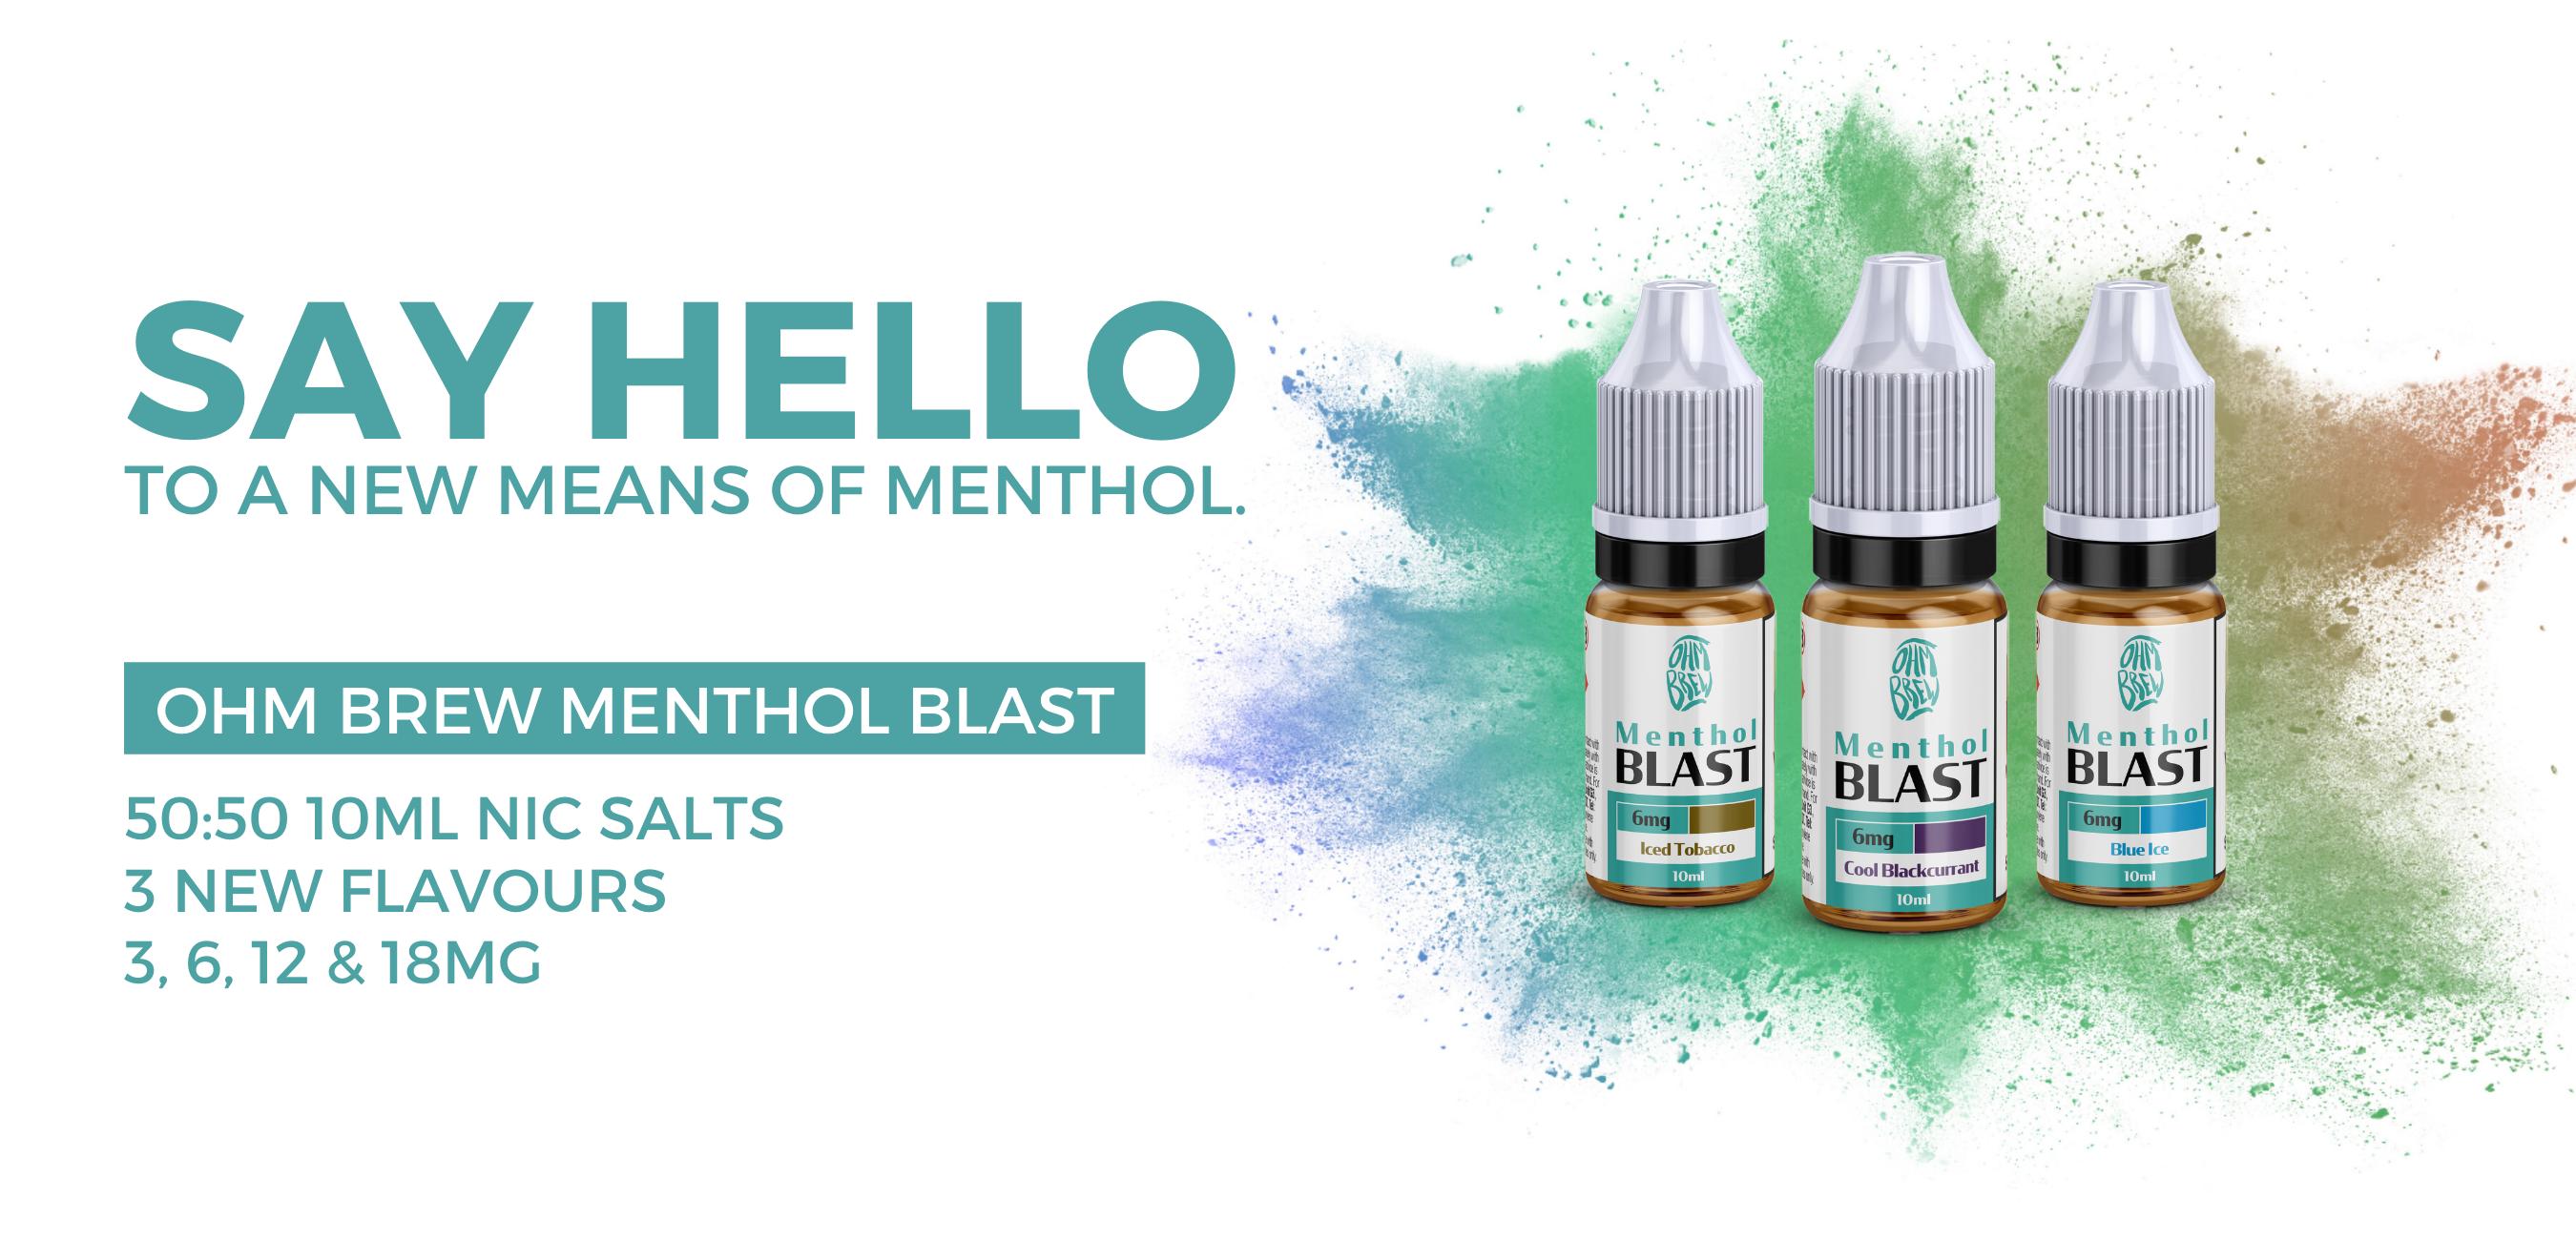 Ohm Brew Menthol Blast. Menthol Nic Salt E-Liquid Product Range Home Page Banner